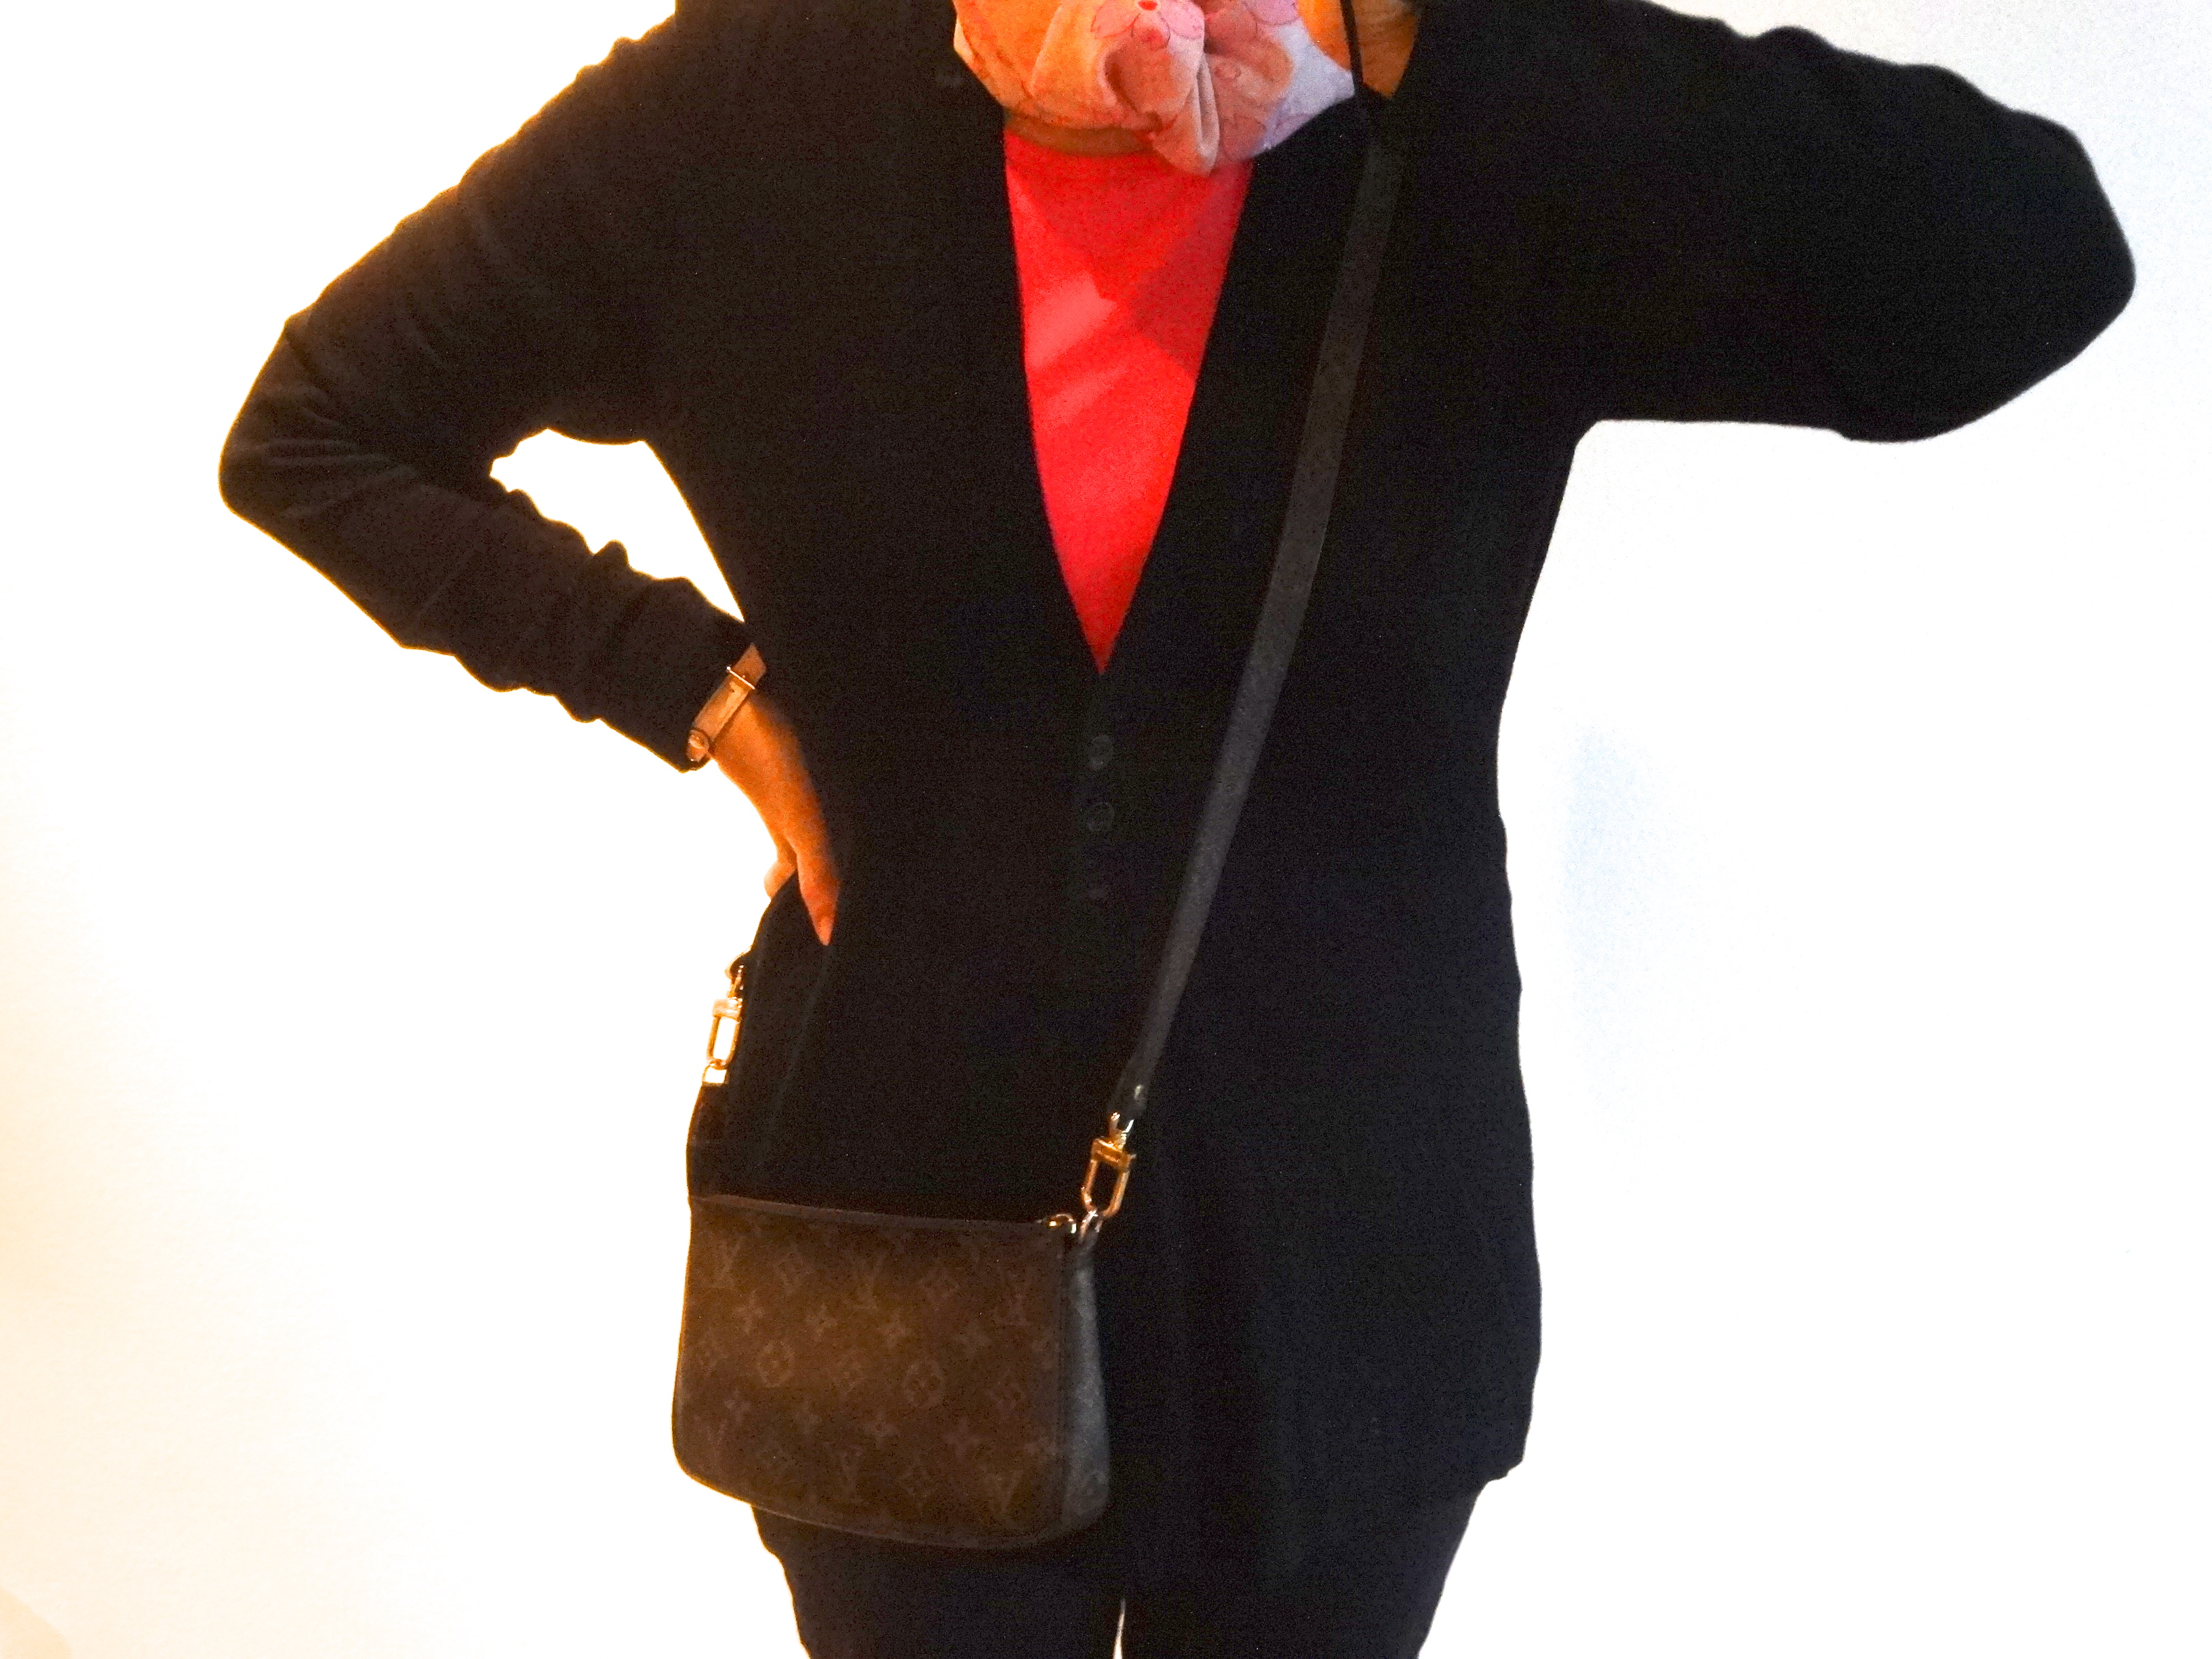 Pochette Accessoires & Laniere Toile, Monogram shoulder strap / langer Schulterriemen